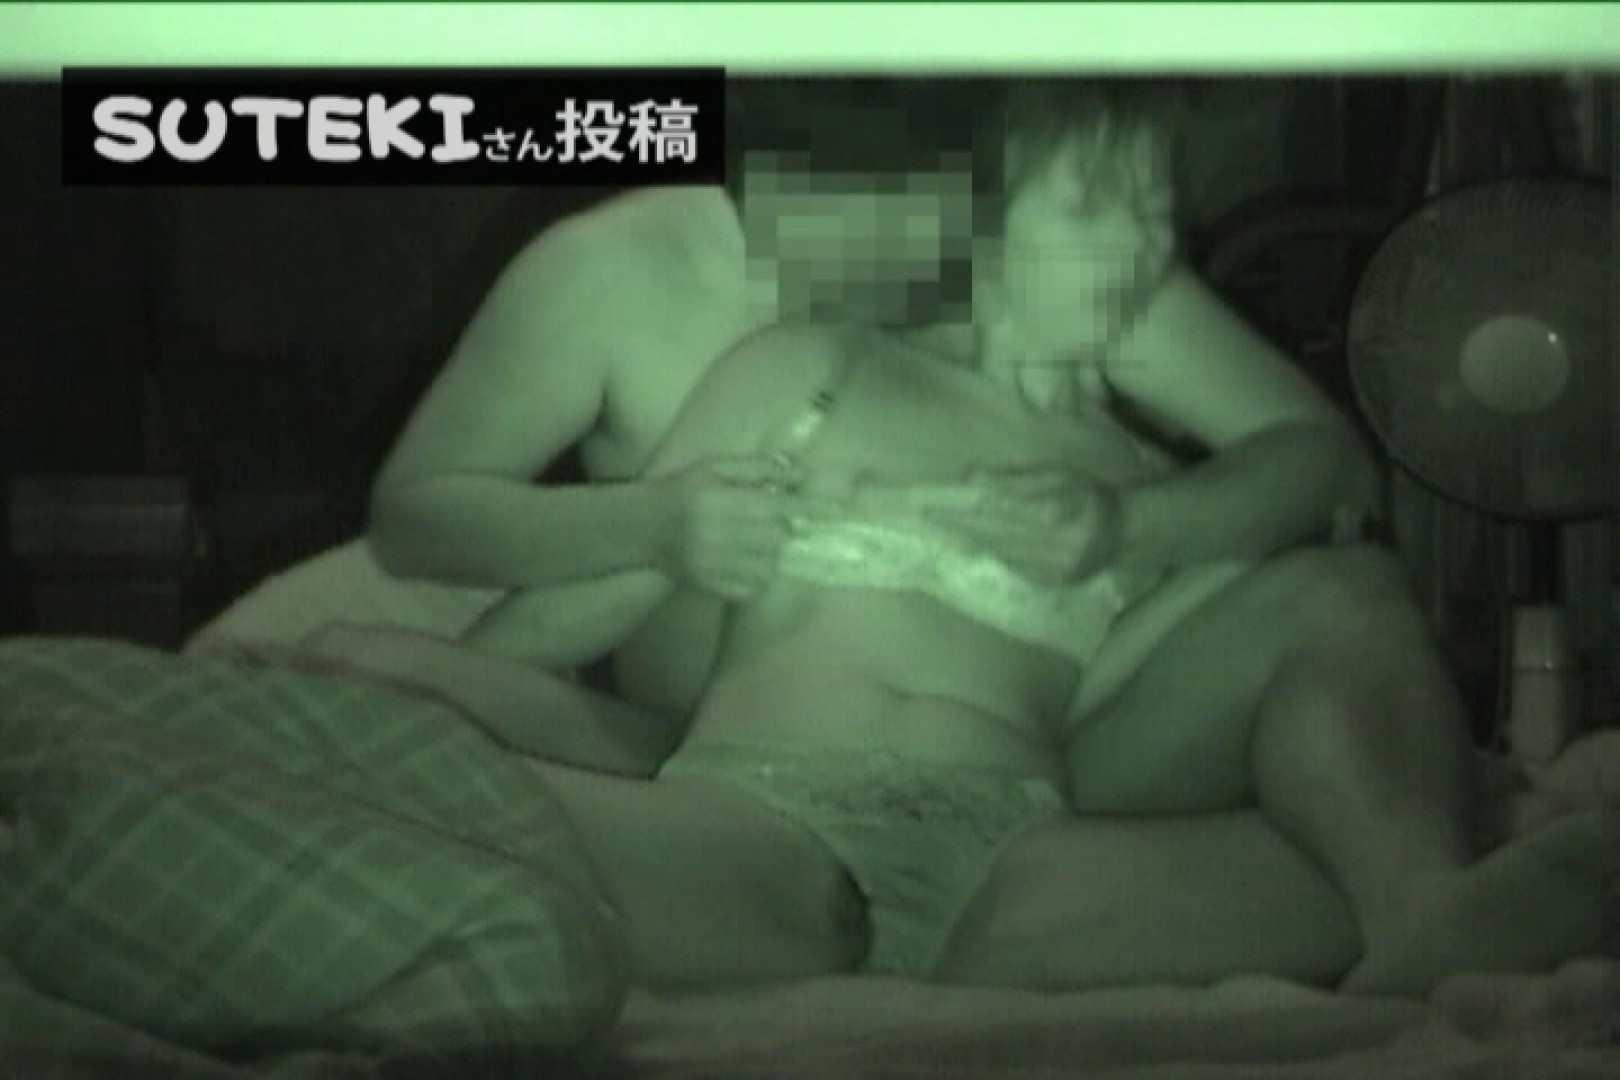 SUTEKIさん投稿 スーパーナイトショット SEX映像 われめAV動画紹介 67pic 3